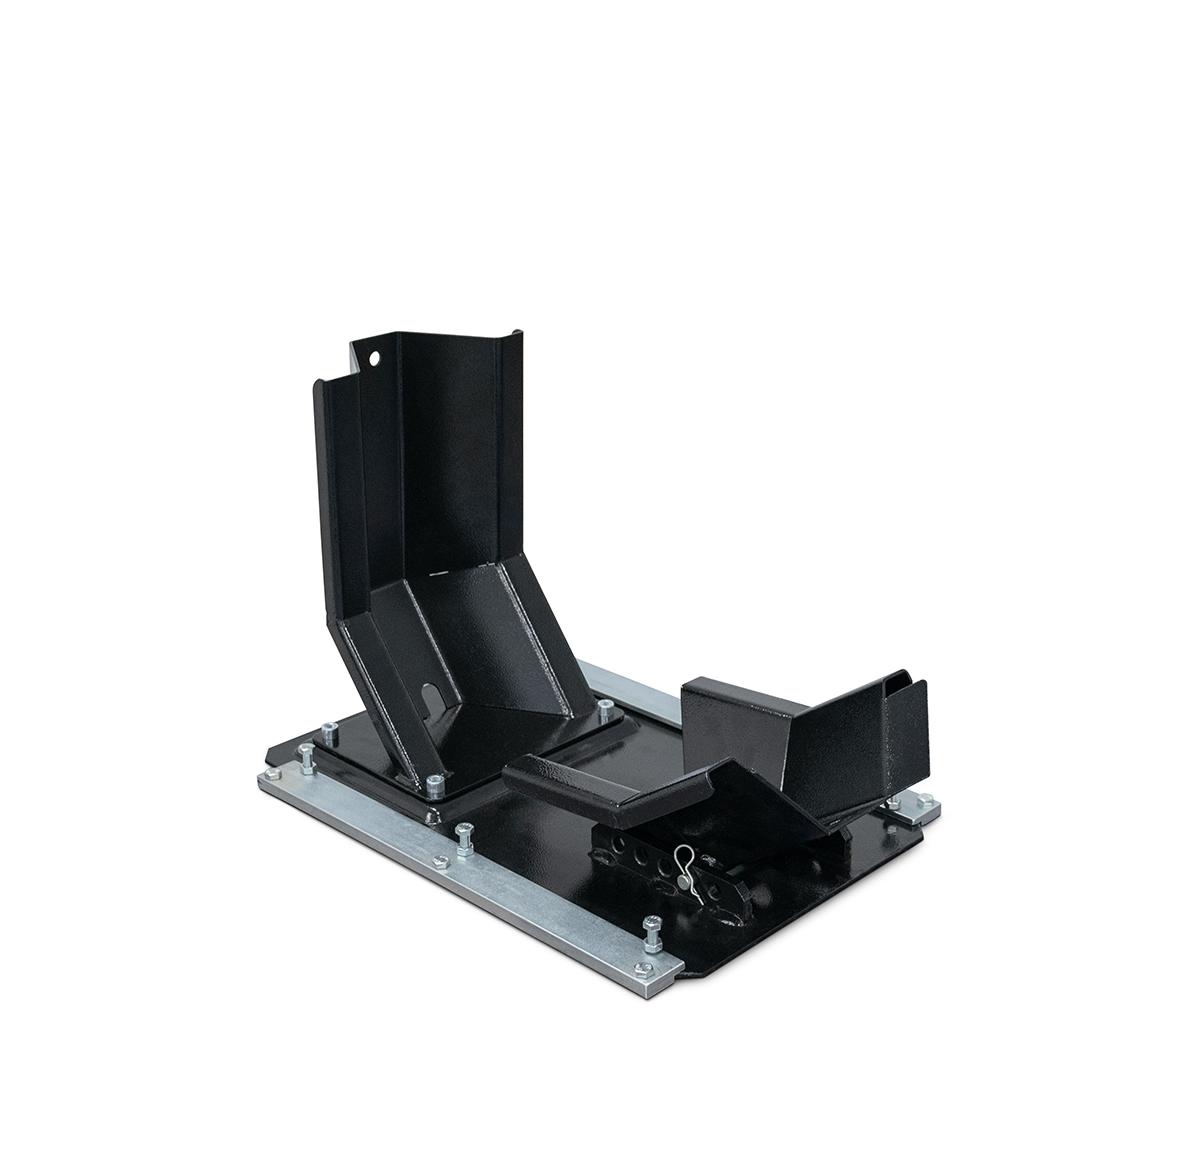 Supporto ruota per MC-1000 n° Art. 130155